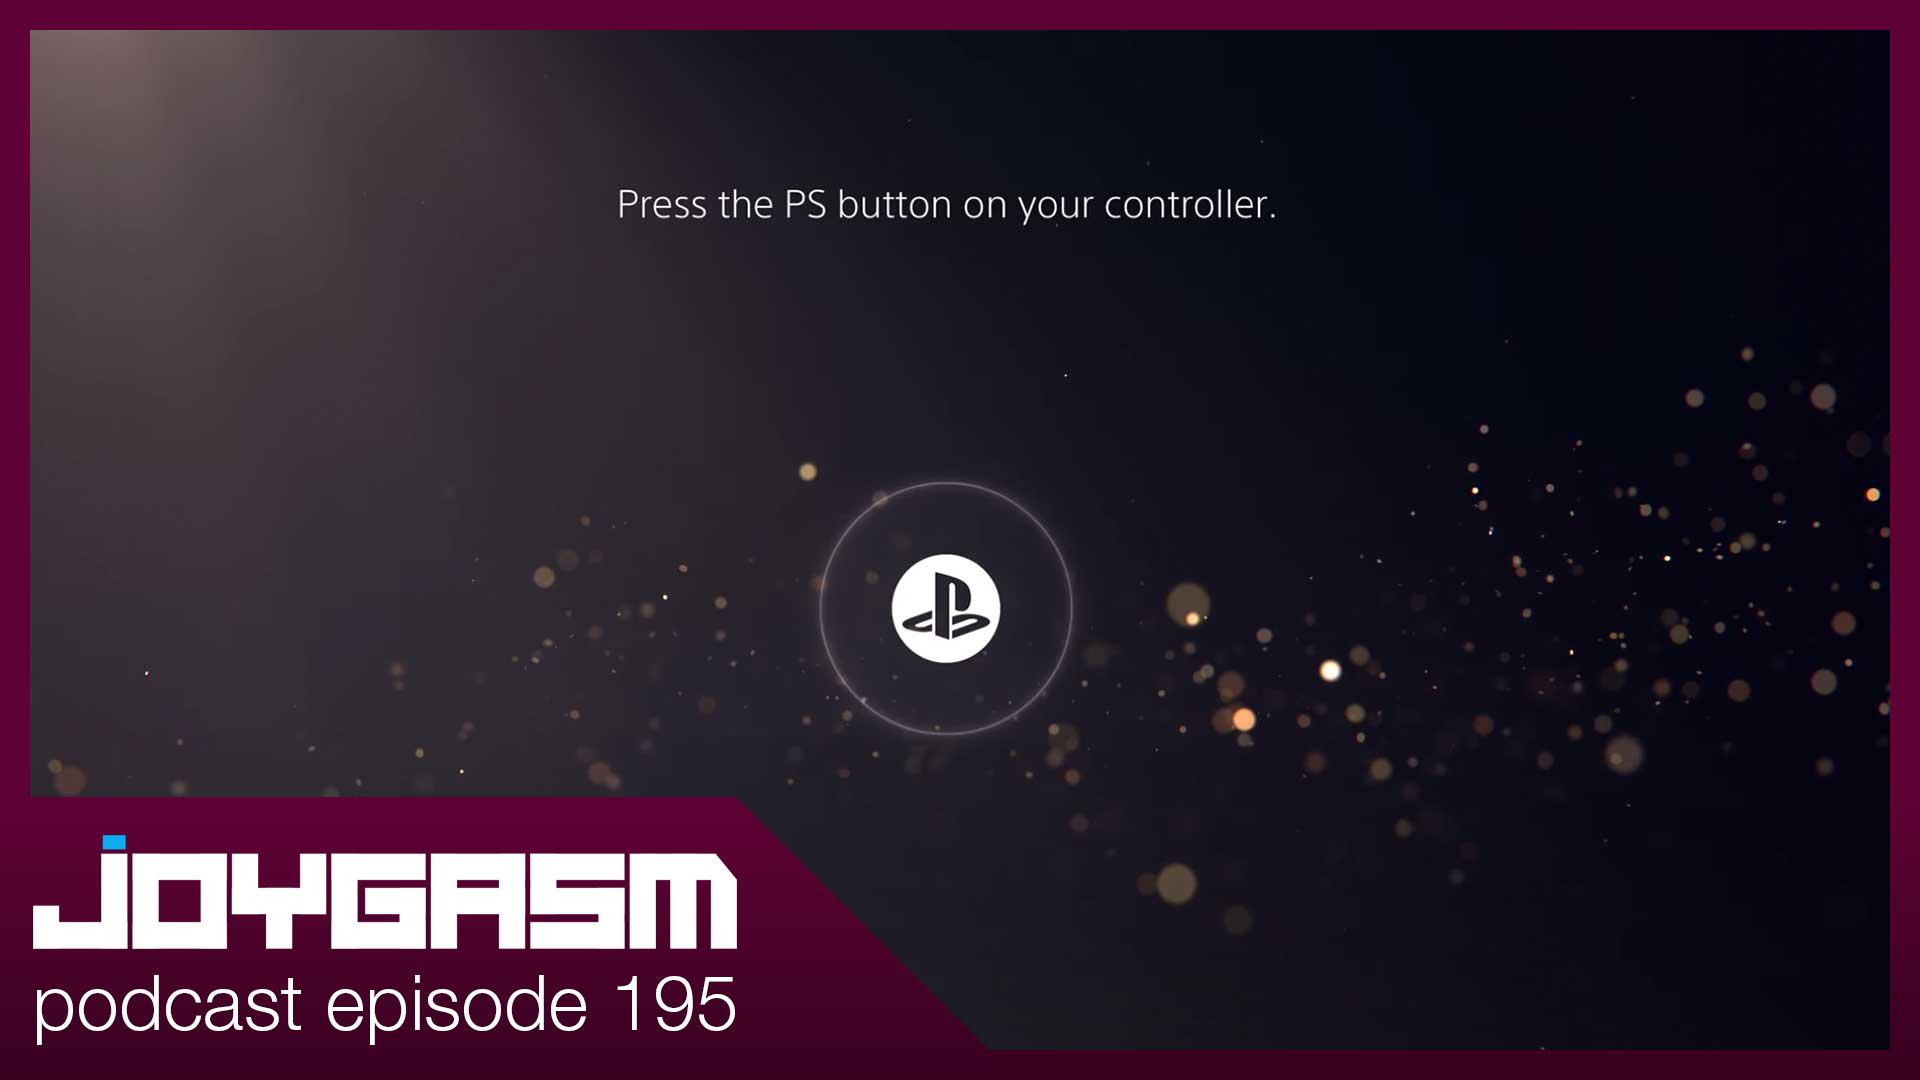 Ep. 195: PS5 UI Impressions